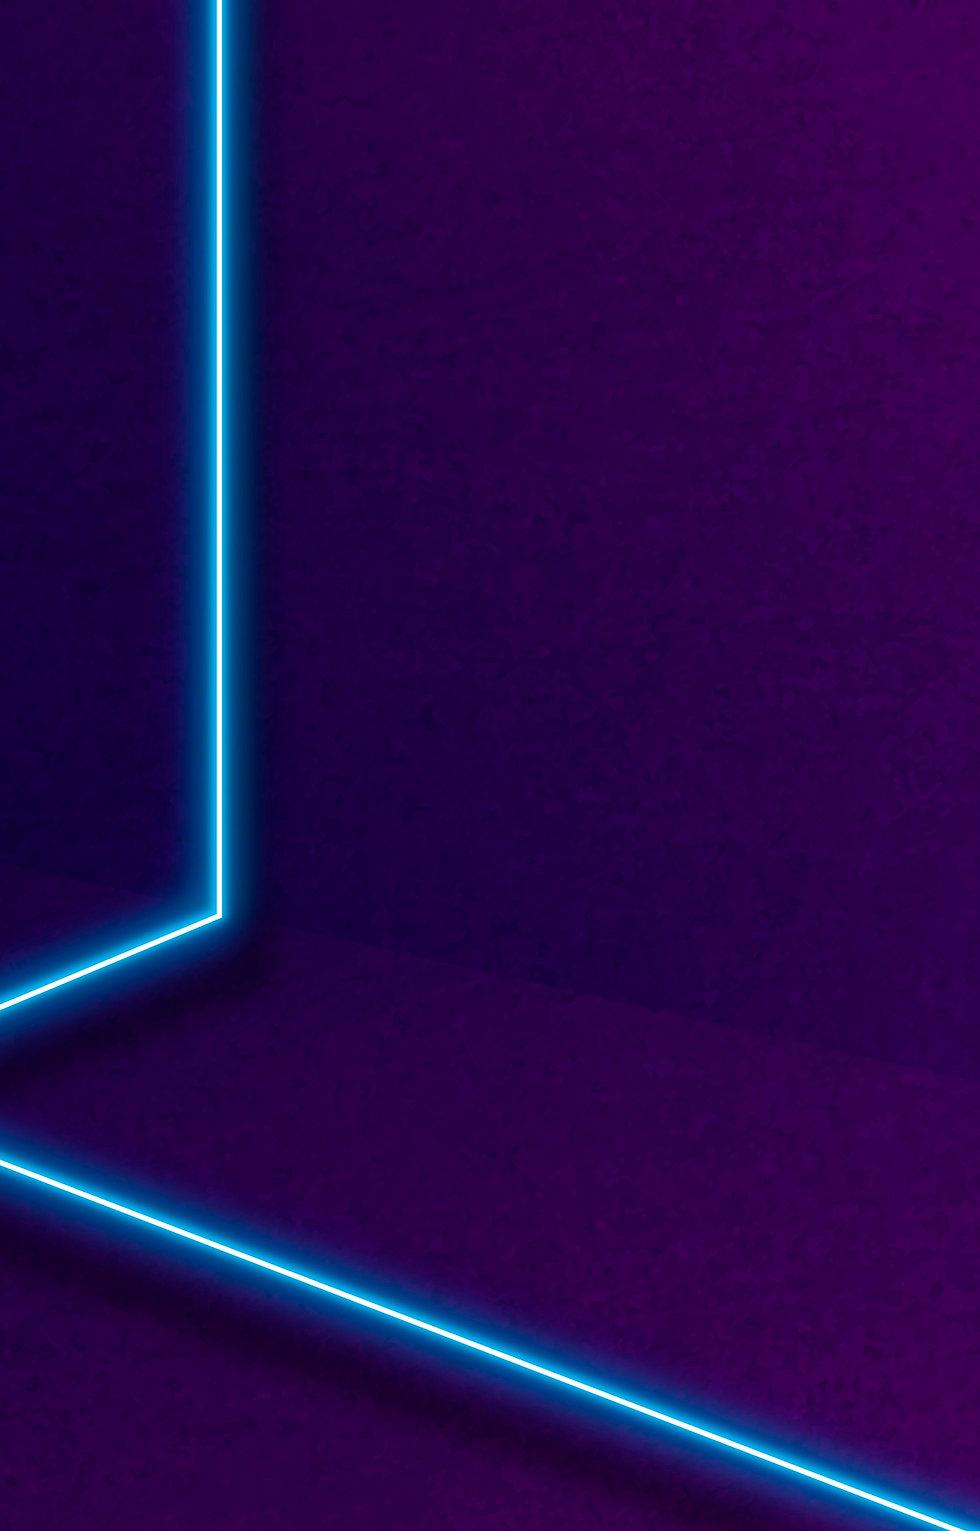 v704-aew-97-neonbackground_edited.jpg